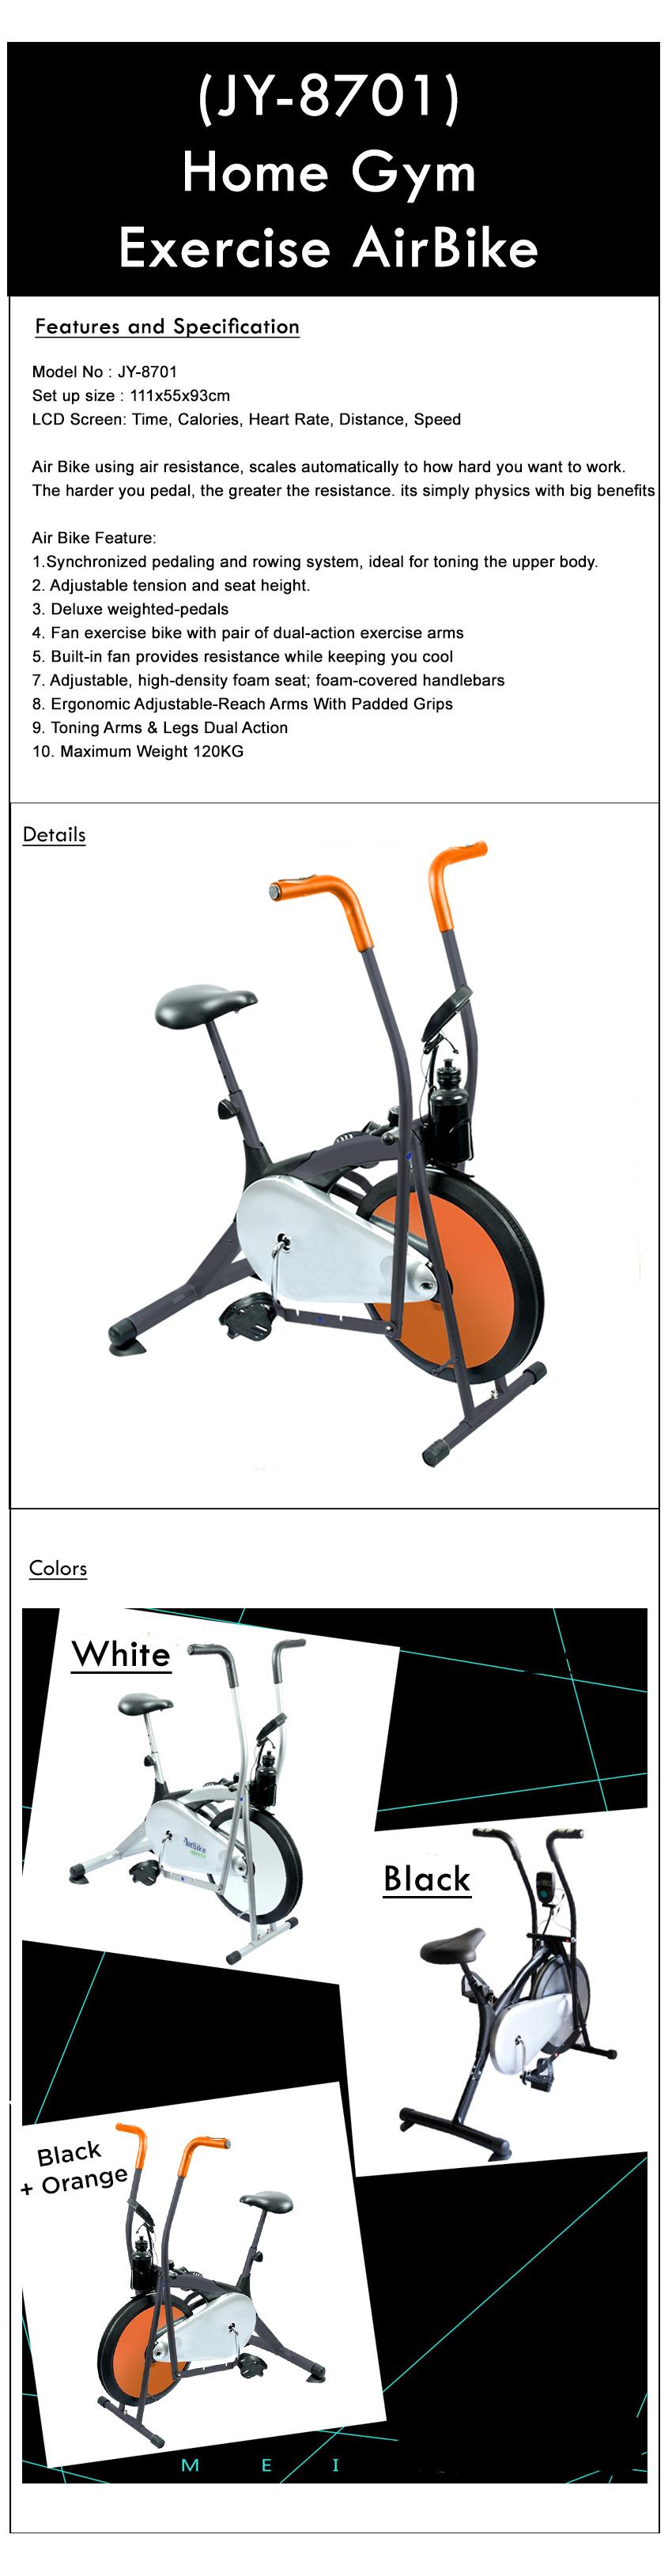 JY-8701-Home-Gym-Exercise-AirBike-orange.jpg